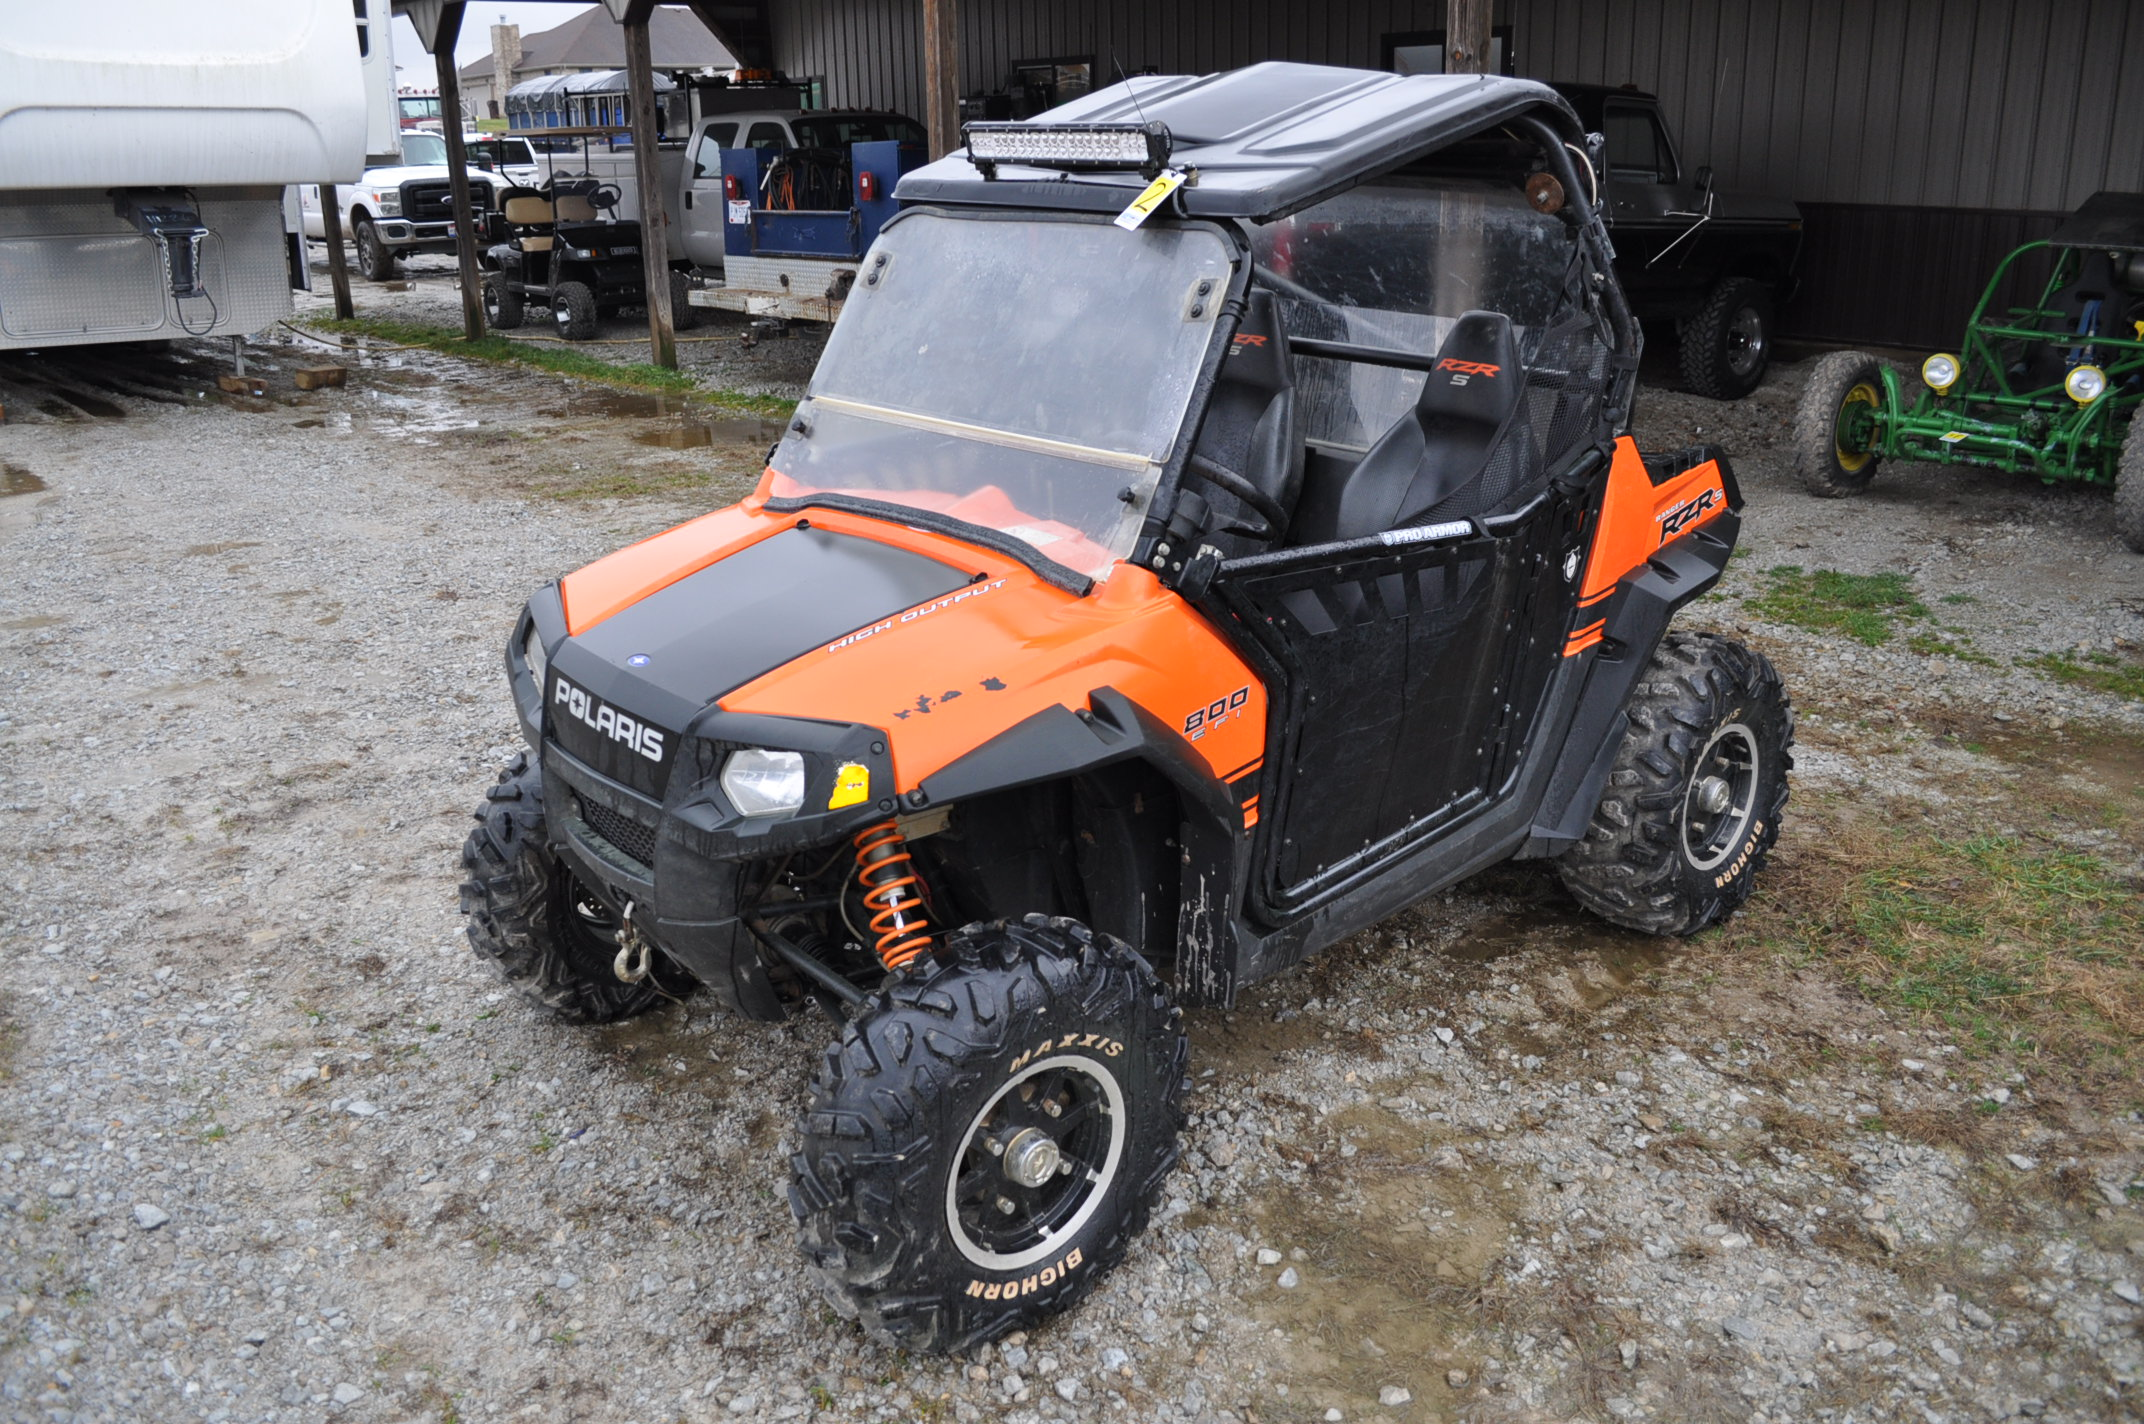 2010 Polaris Ranger RZR, 800 EFI, AT26 x 12 R 12 rear, AT26 x 9 R 12 front, half doors, 102 hrs, 899